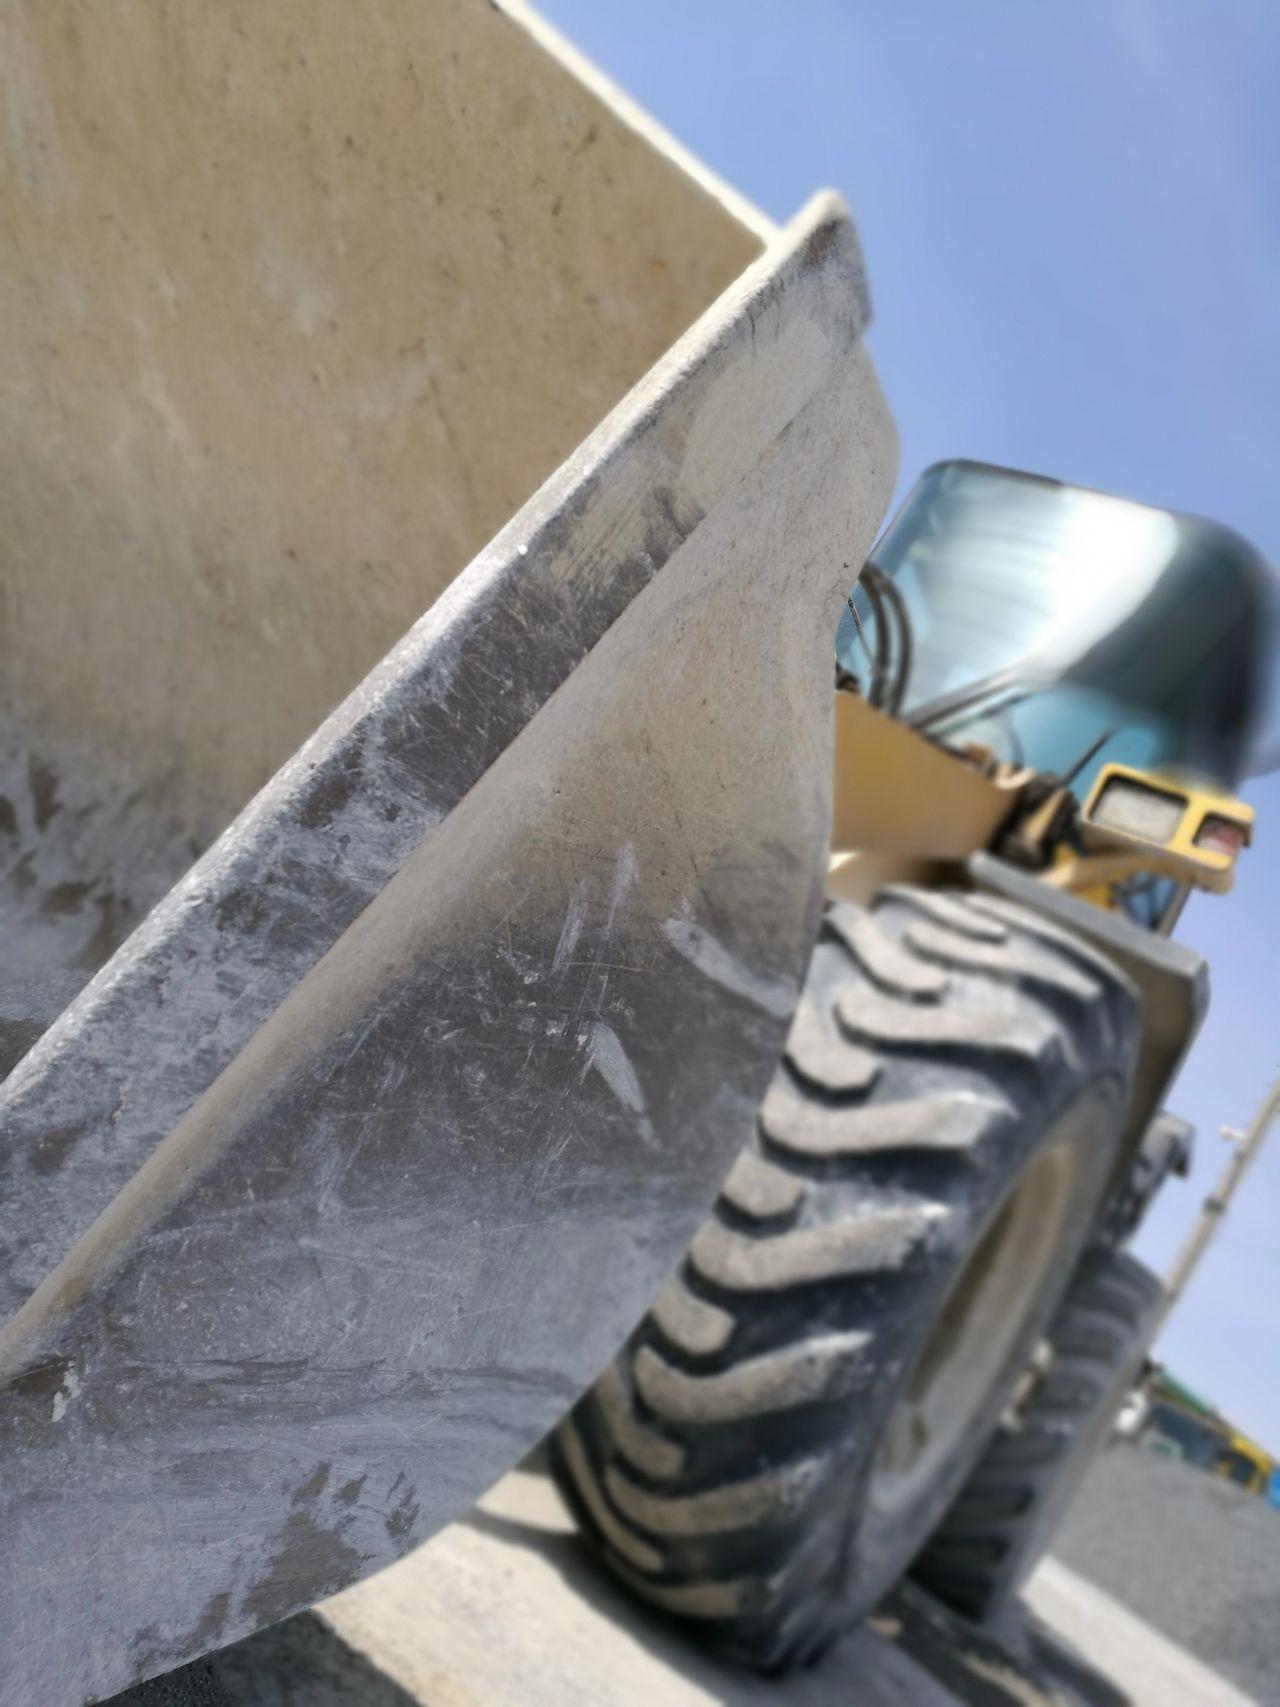 Transportation Close-up Driving Outdoors No People Day Tire Motorsport Shovelhead